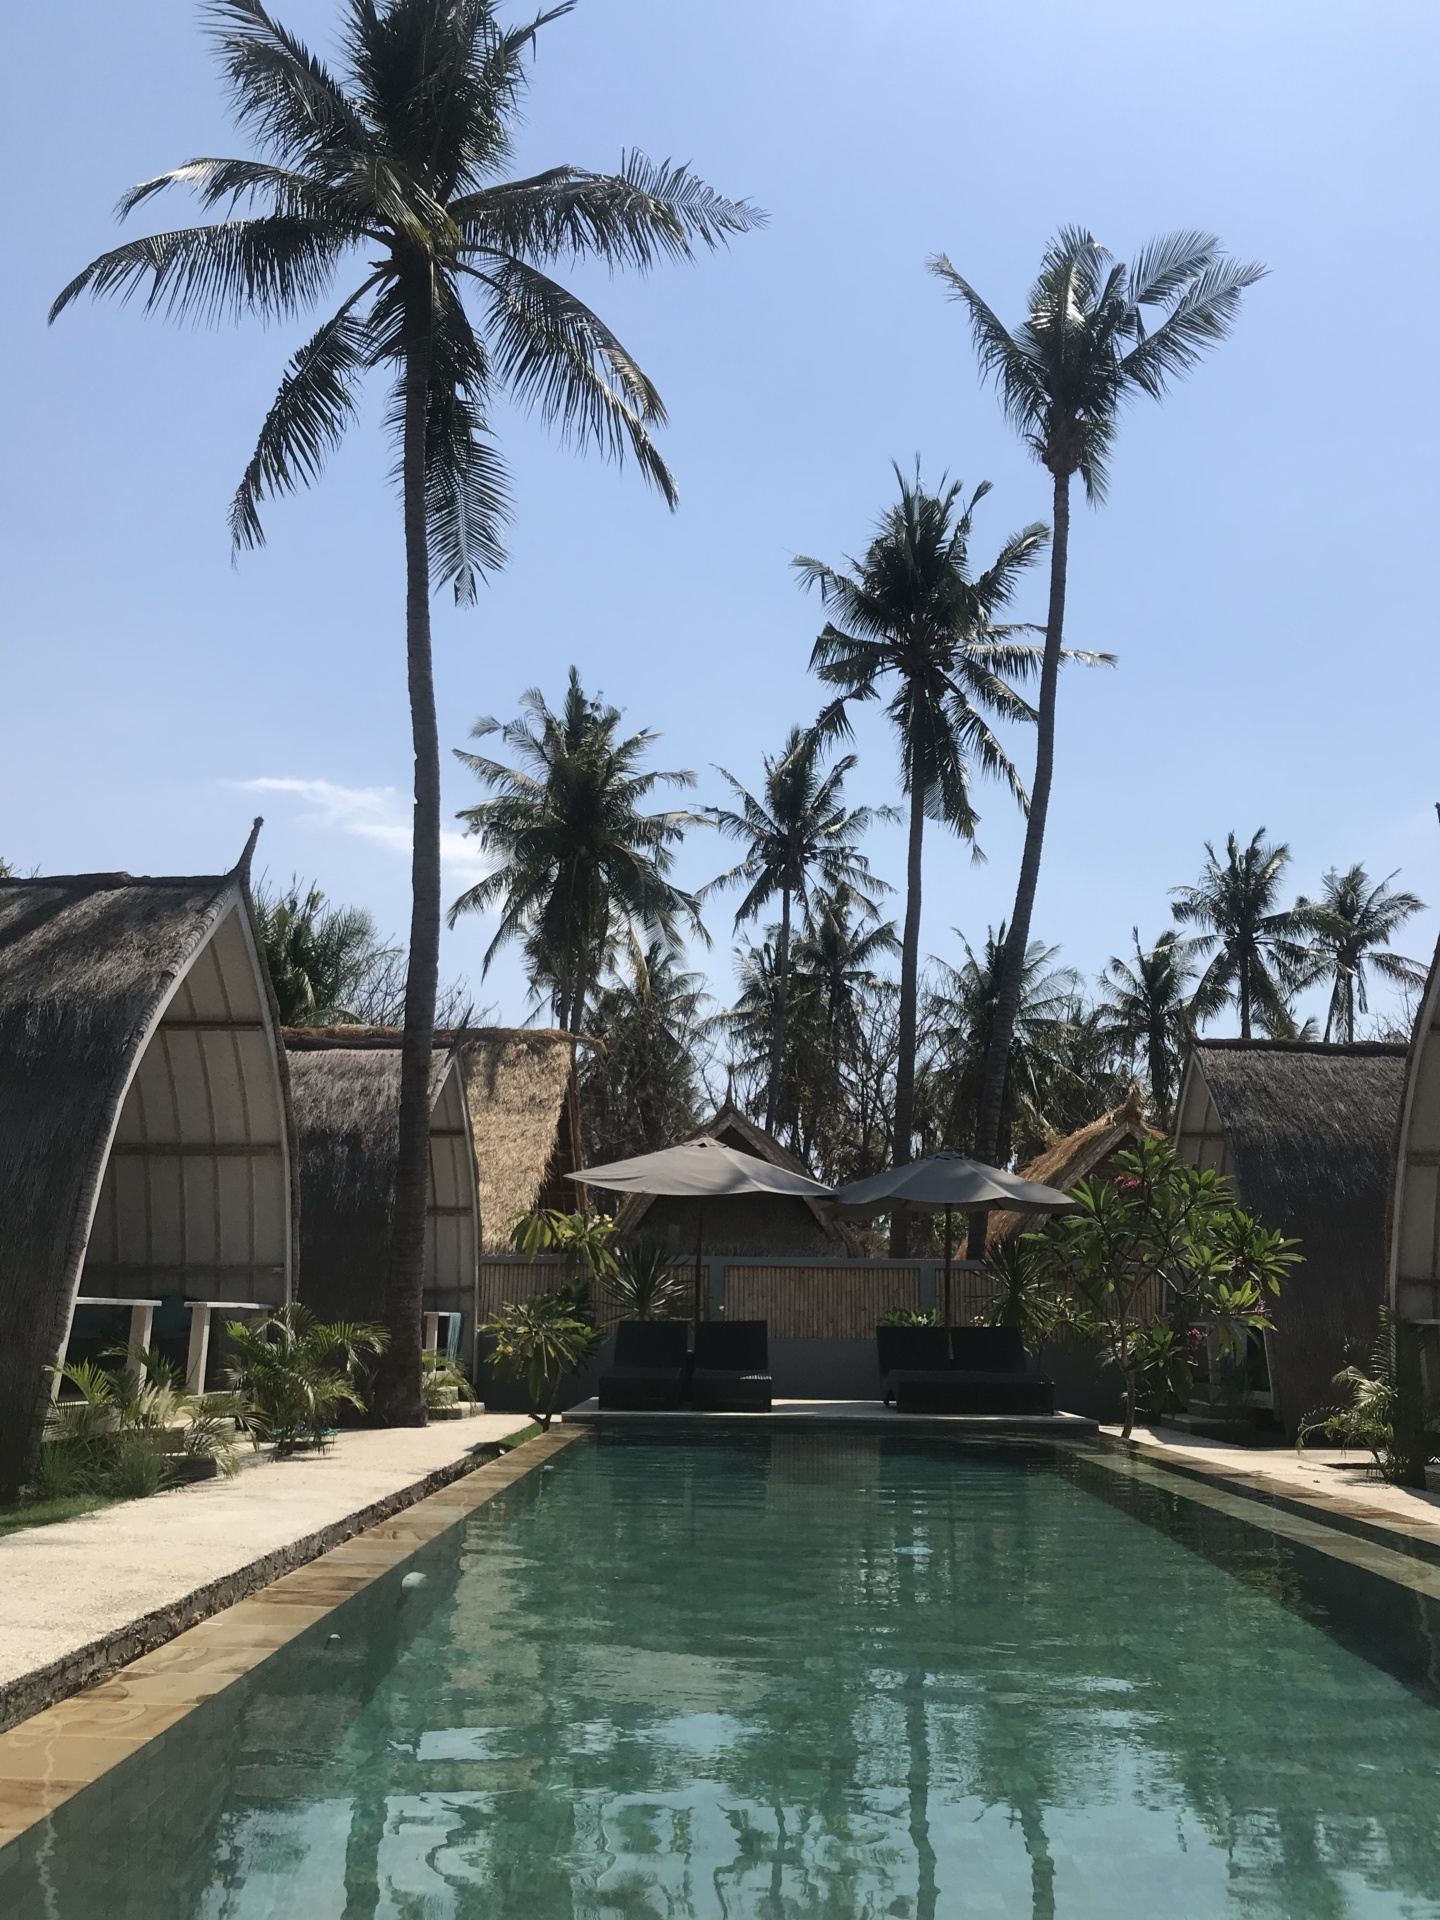 Wanderlust bee - Gili Meno, Bali